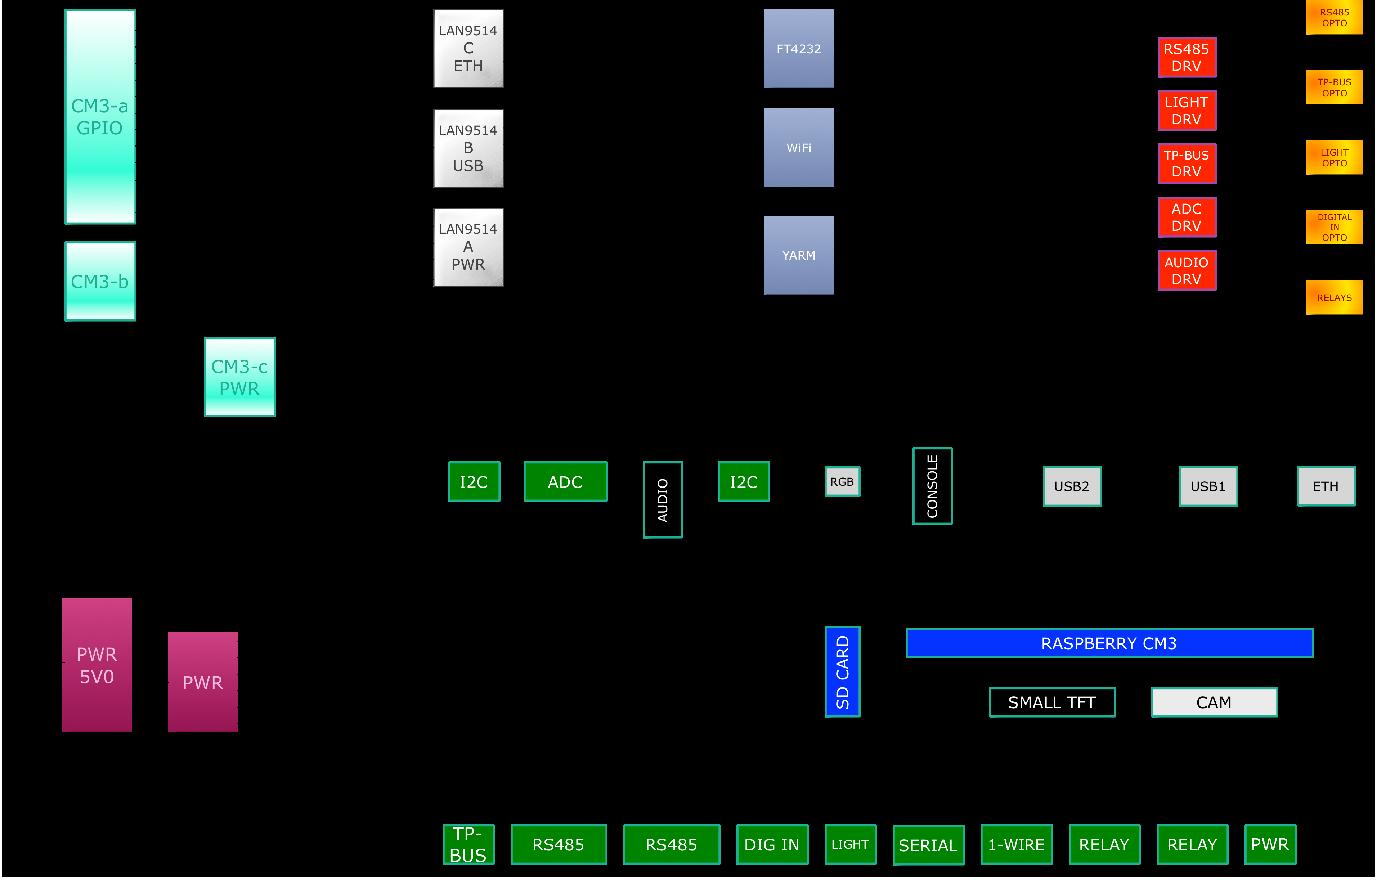 CM3-HOME schematic on